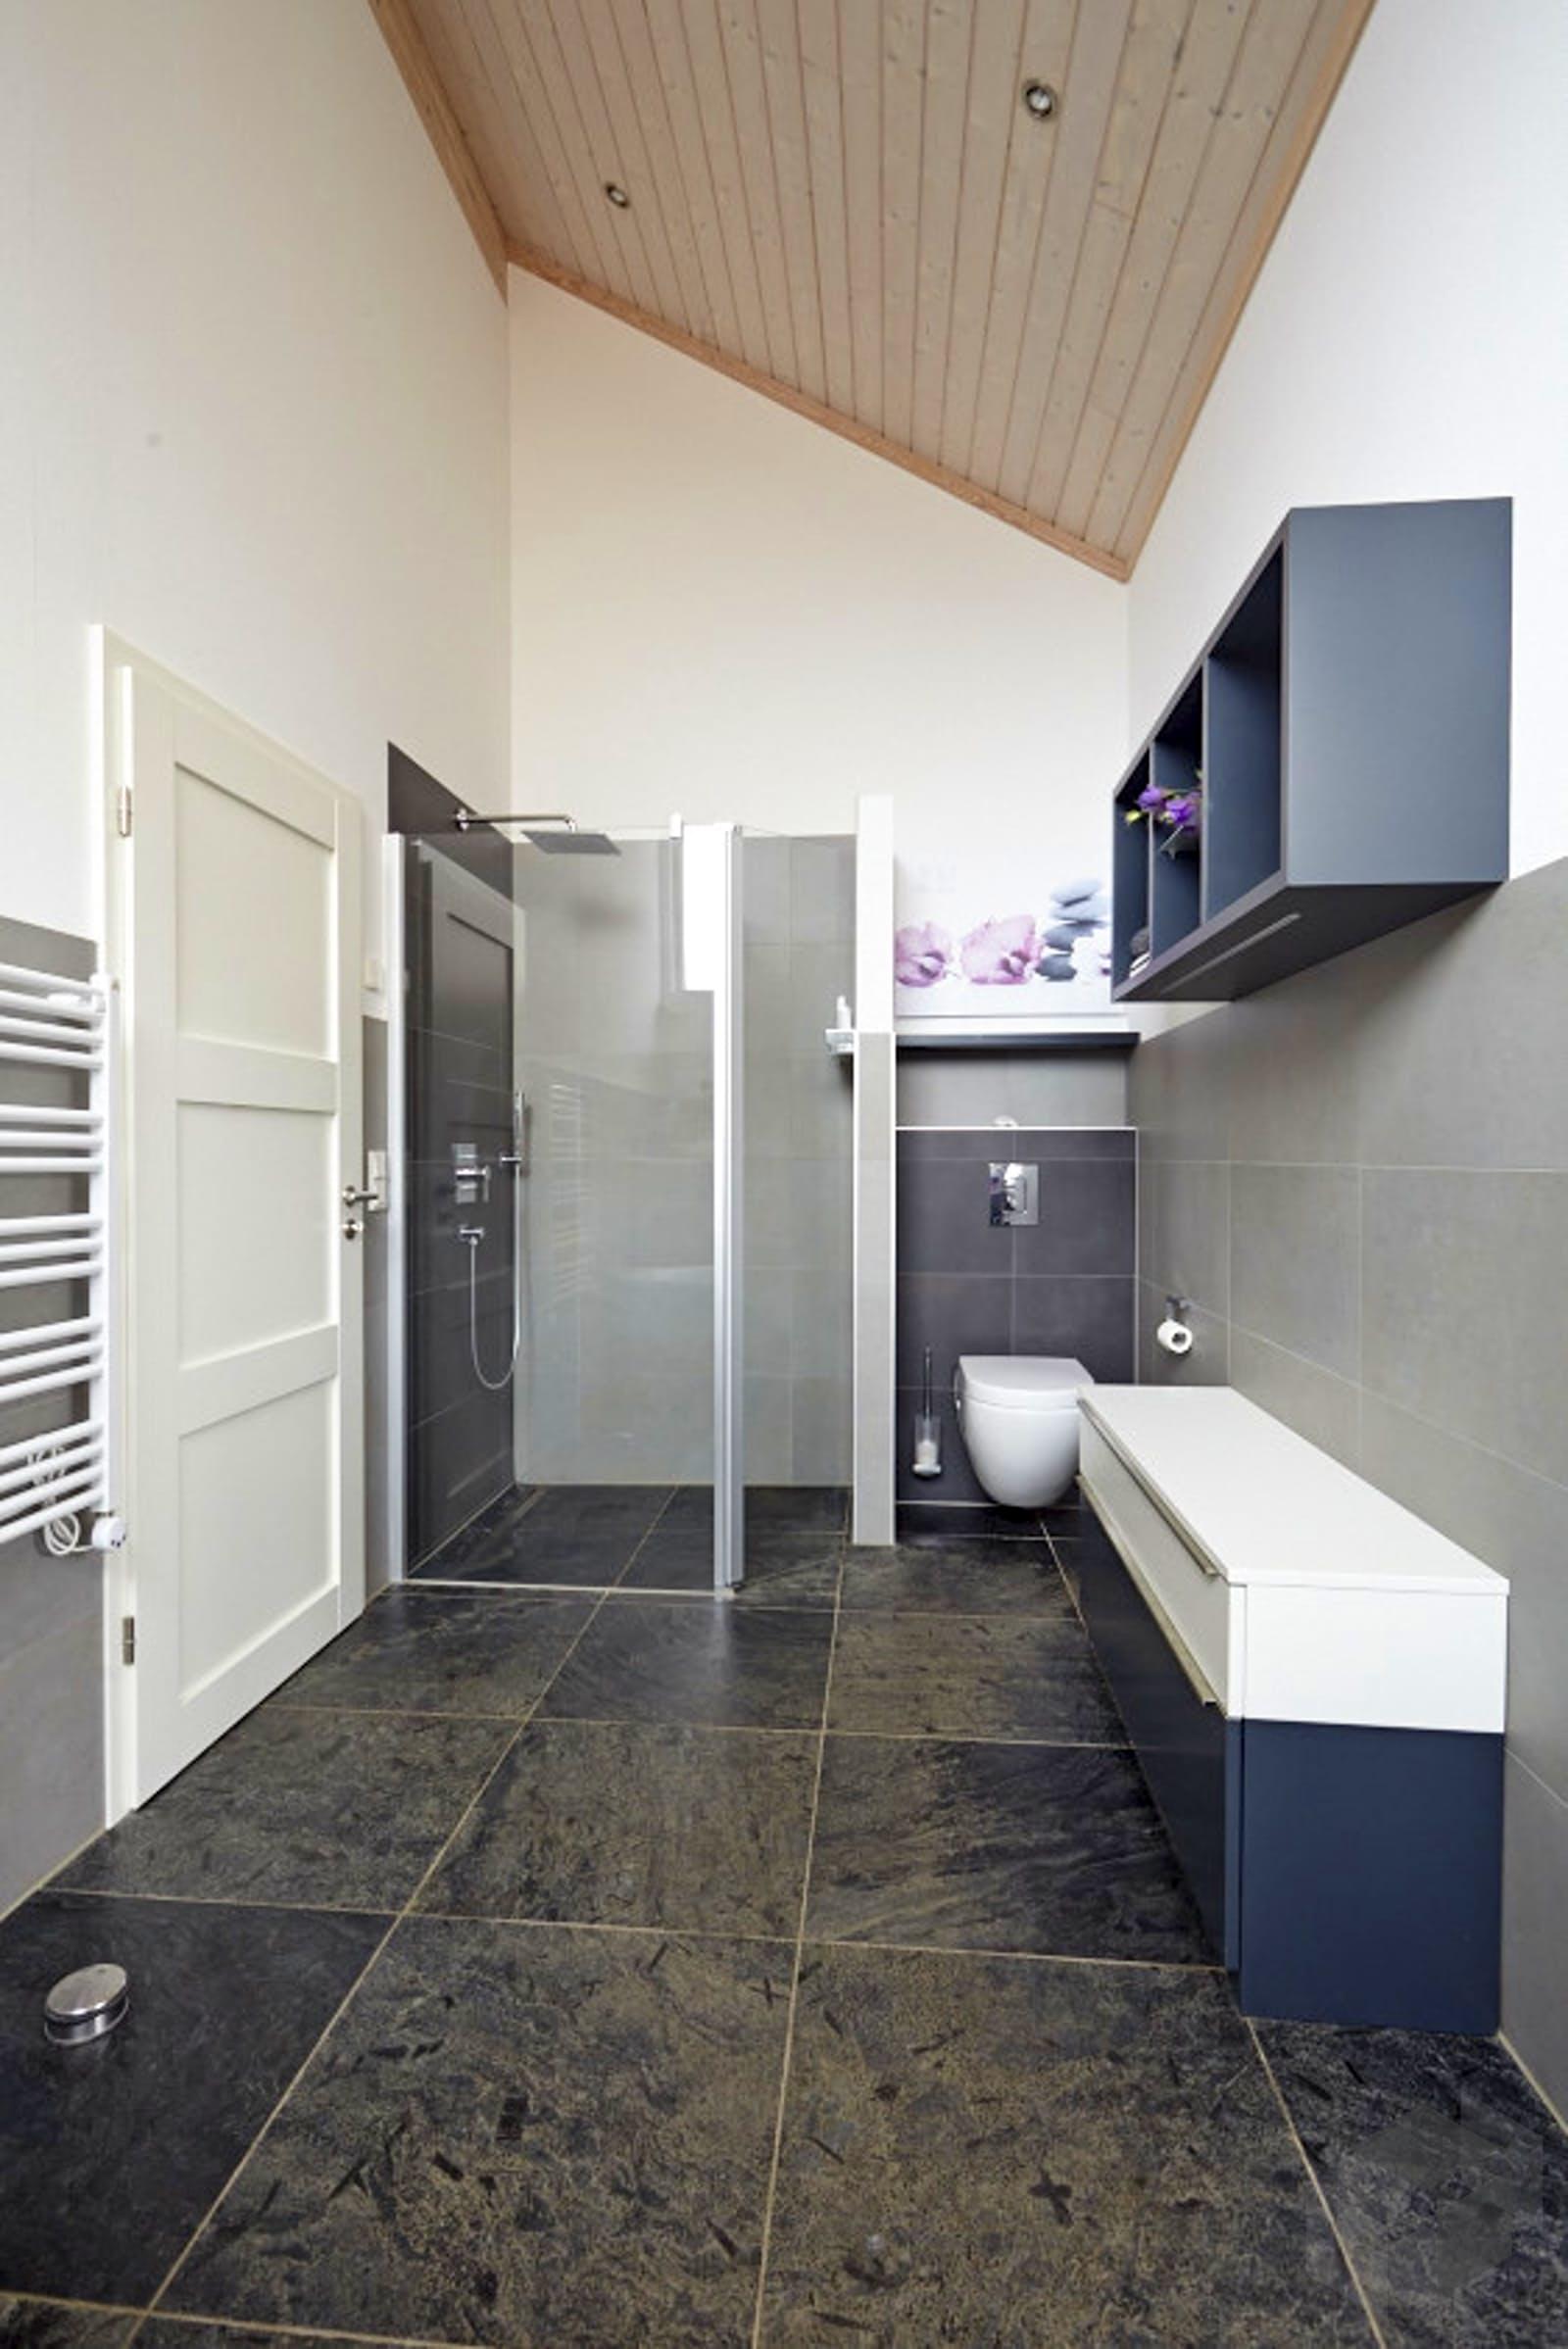 lindholm 92 27 inactive von ebk haus komplette daten bersicht. Black Bedroom Furniture Sets. Home Design Ideas